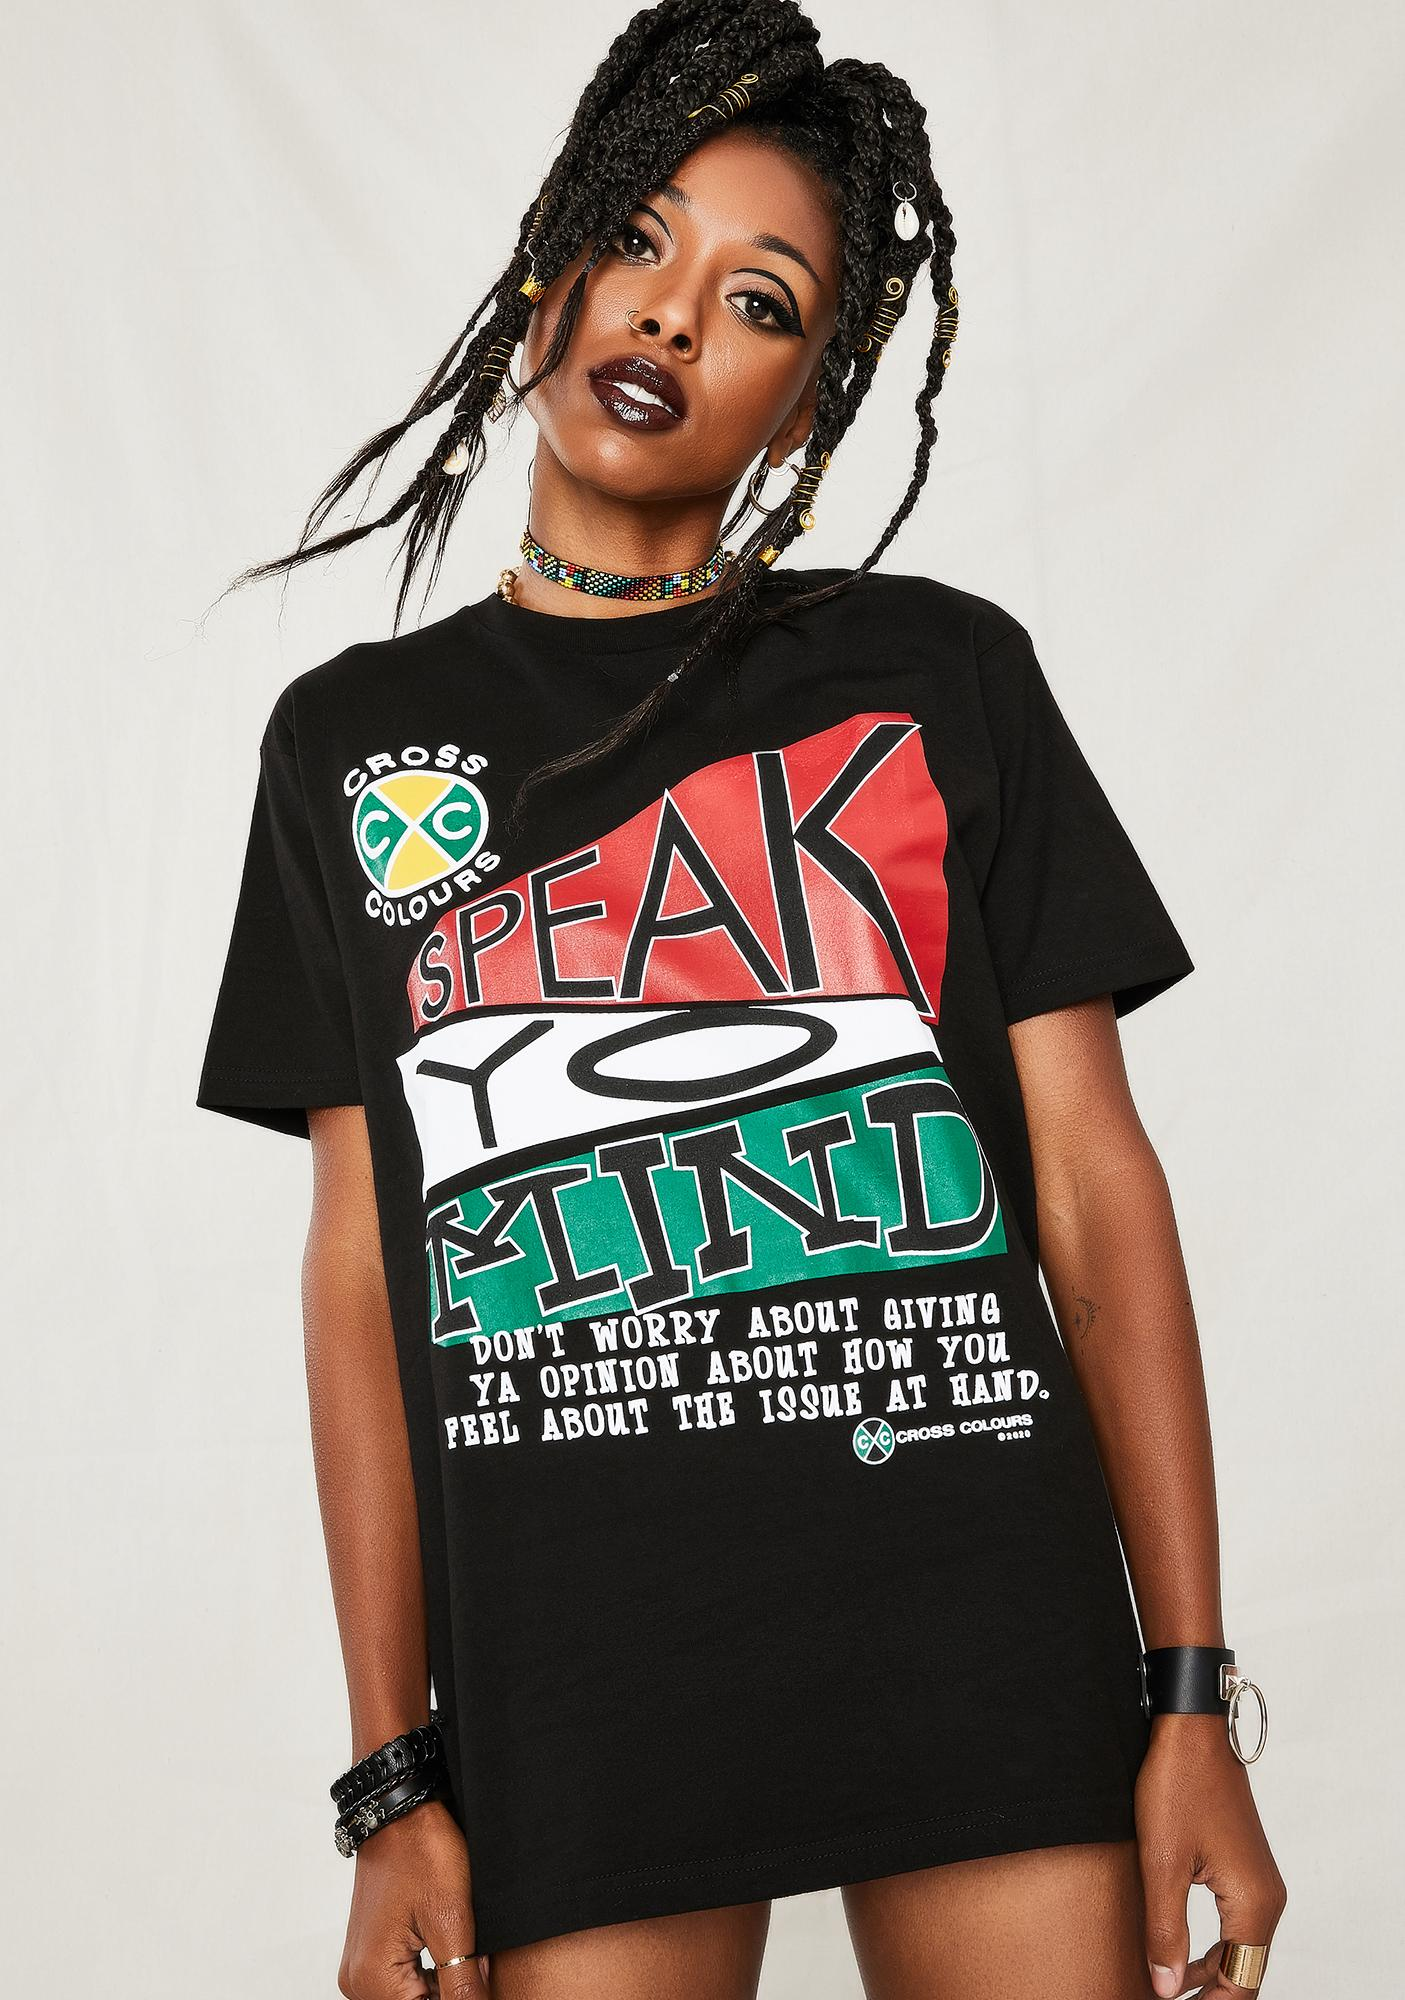 Cross Colours Speak Yo Mind Graphic T-Shirt